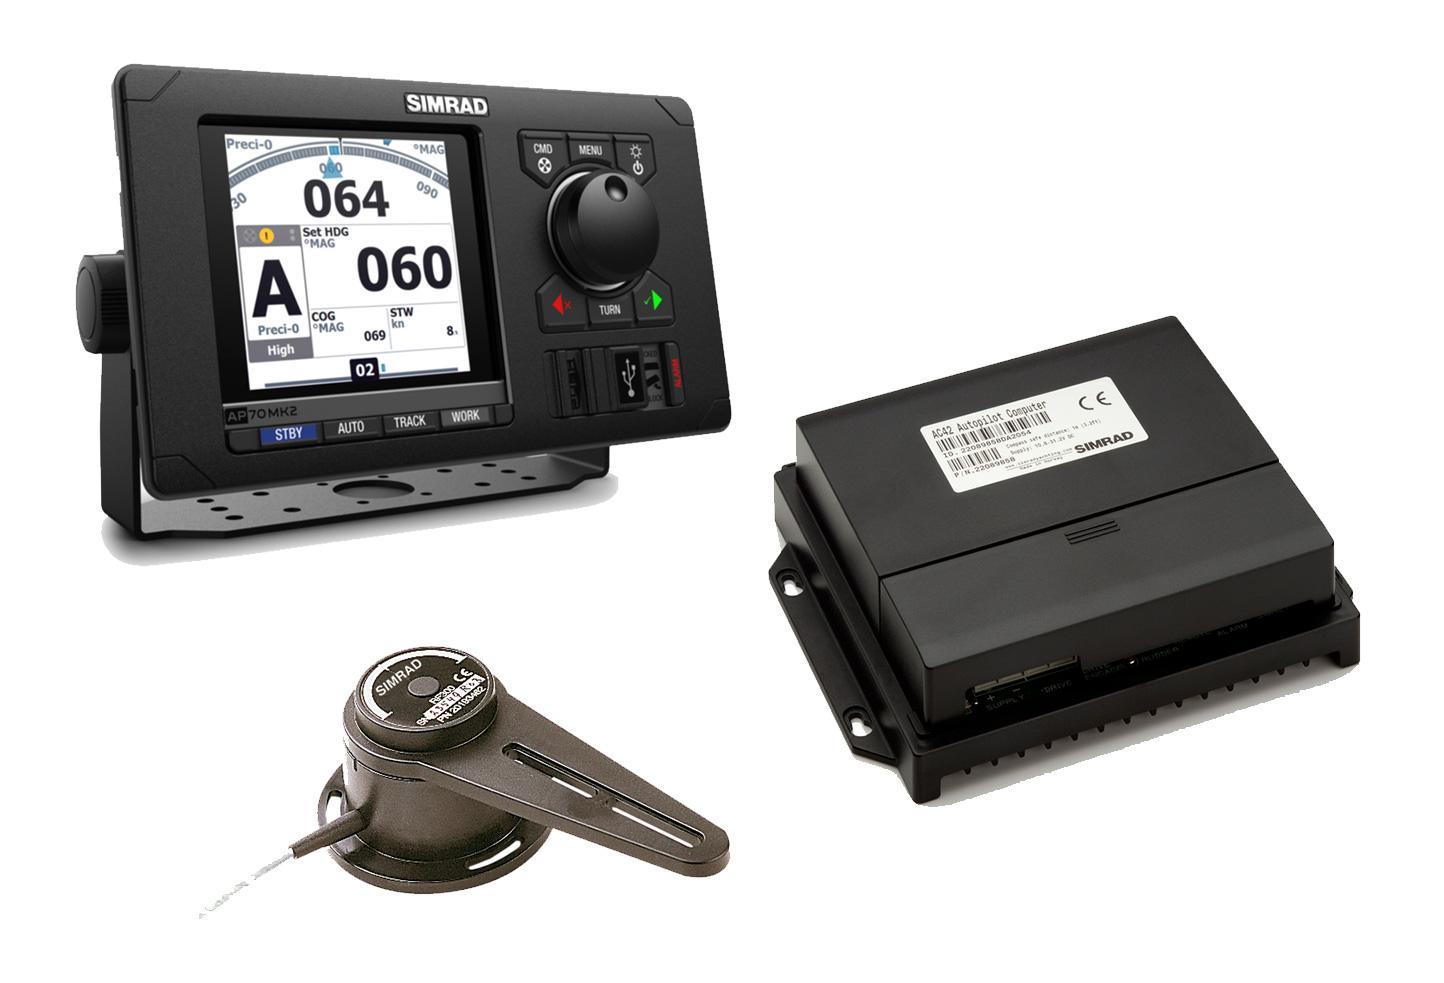 Simrad AP70 MK2 Pro Pack (AP70 MK2, AC70, RF300)